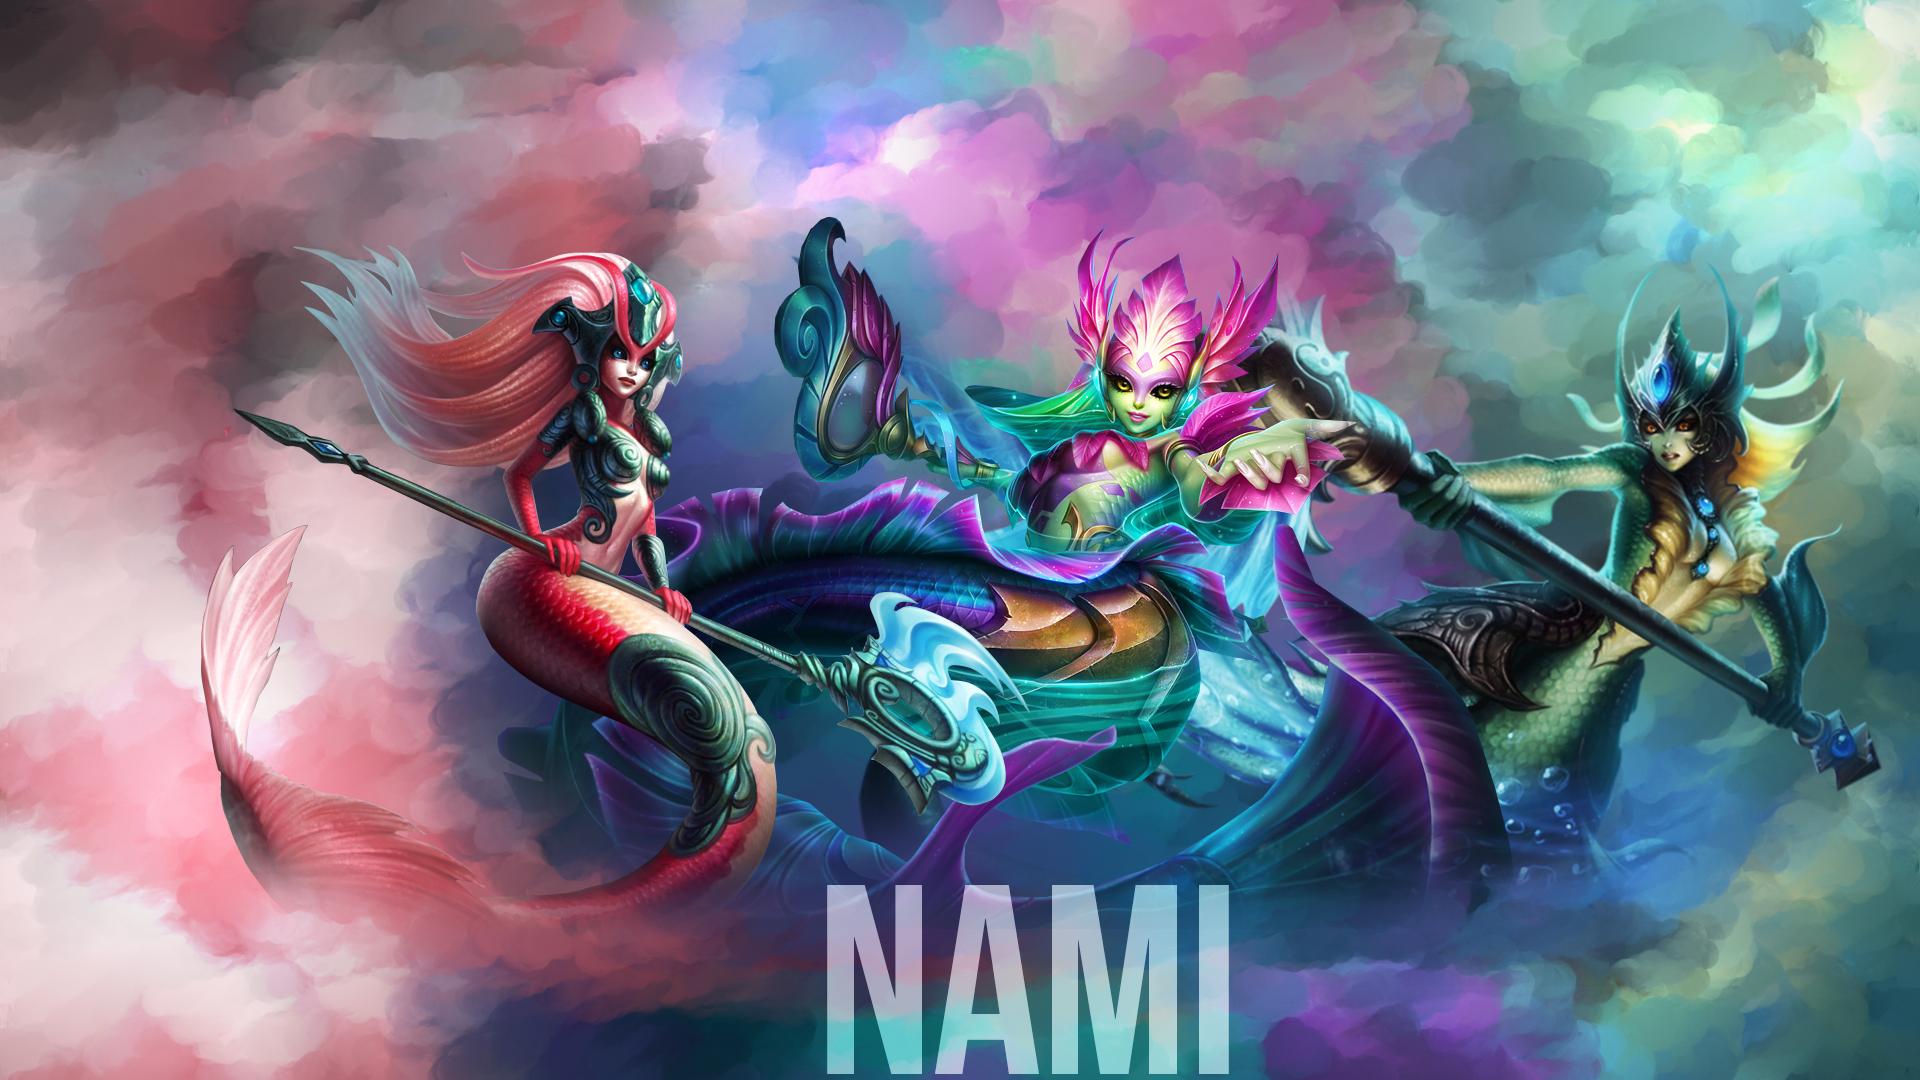 Nami Skins wallpaper